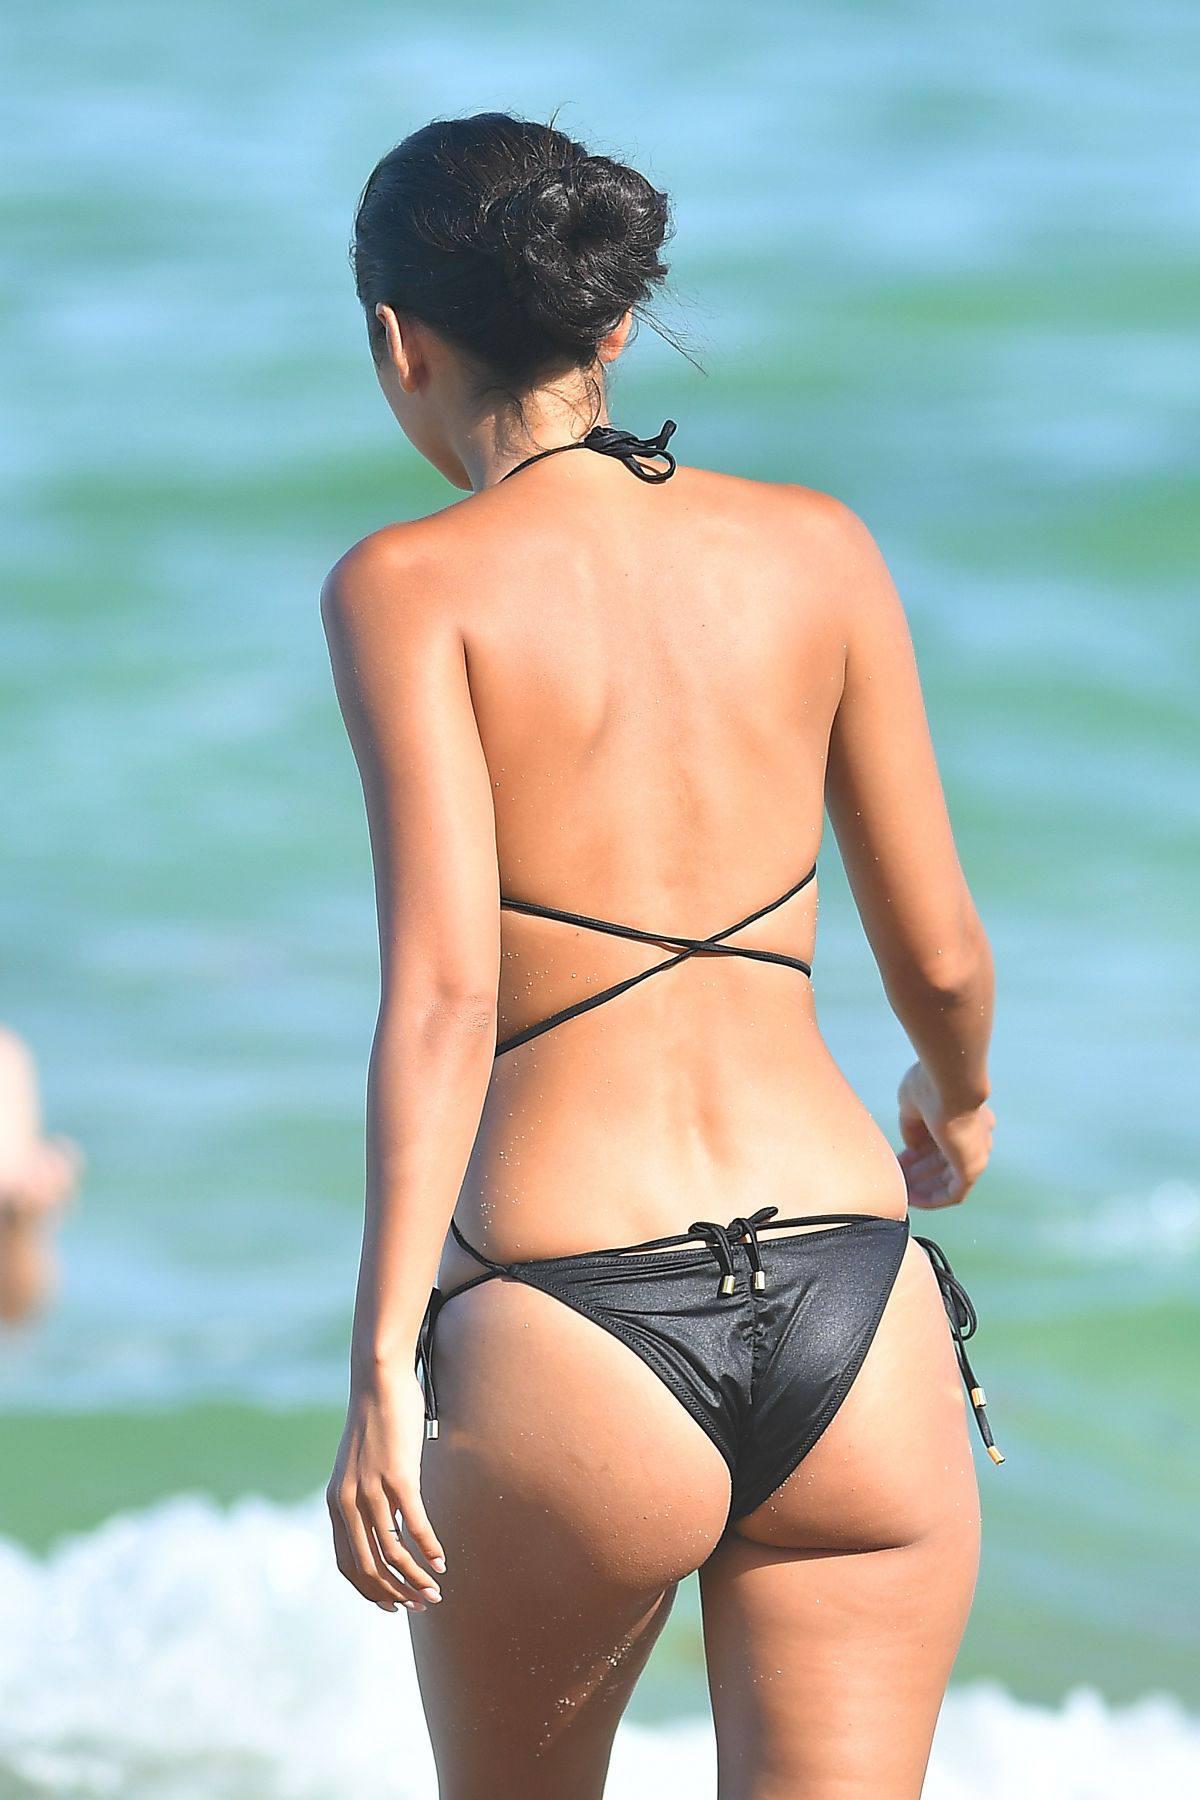 Ambra Gutierrez – Beautiful Body In Small Bikini At The Beach In Miami Beach 0010